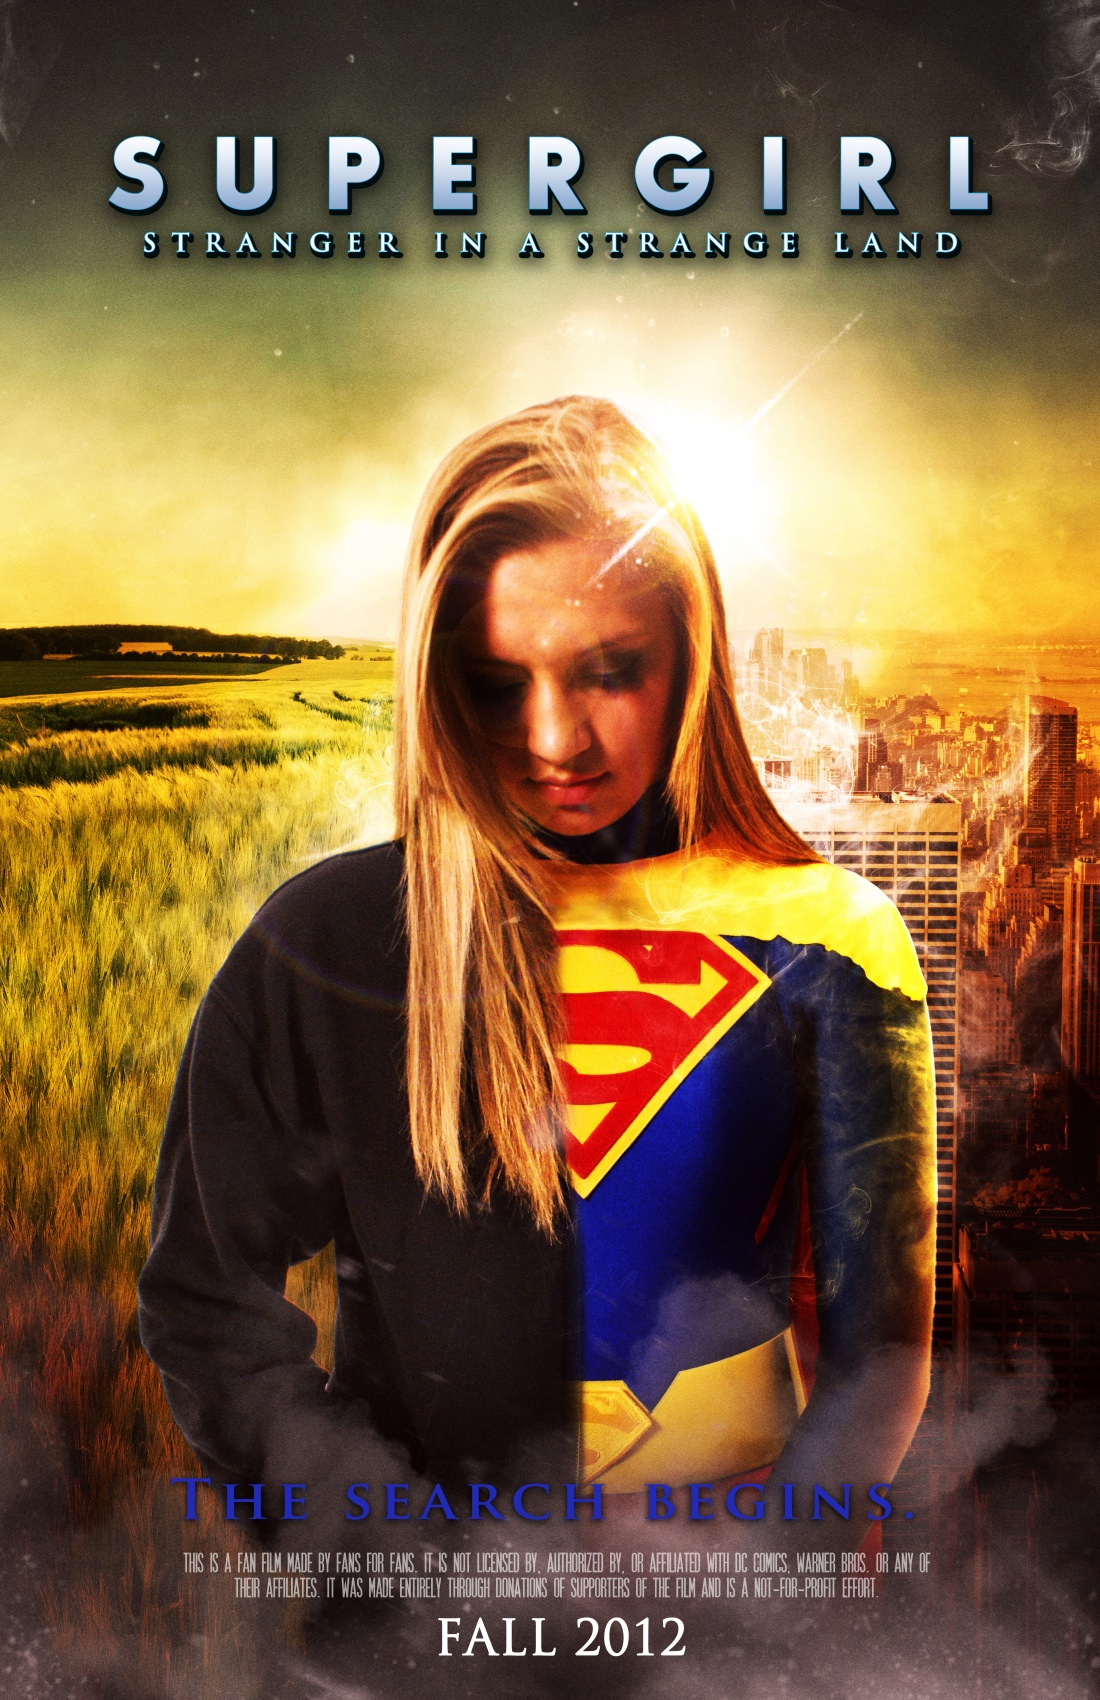 Filmmaker walter c jones tells us that the fan film &;supergirl